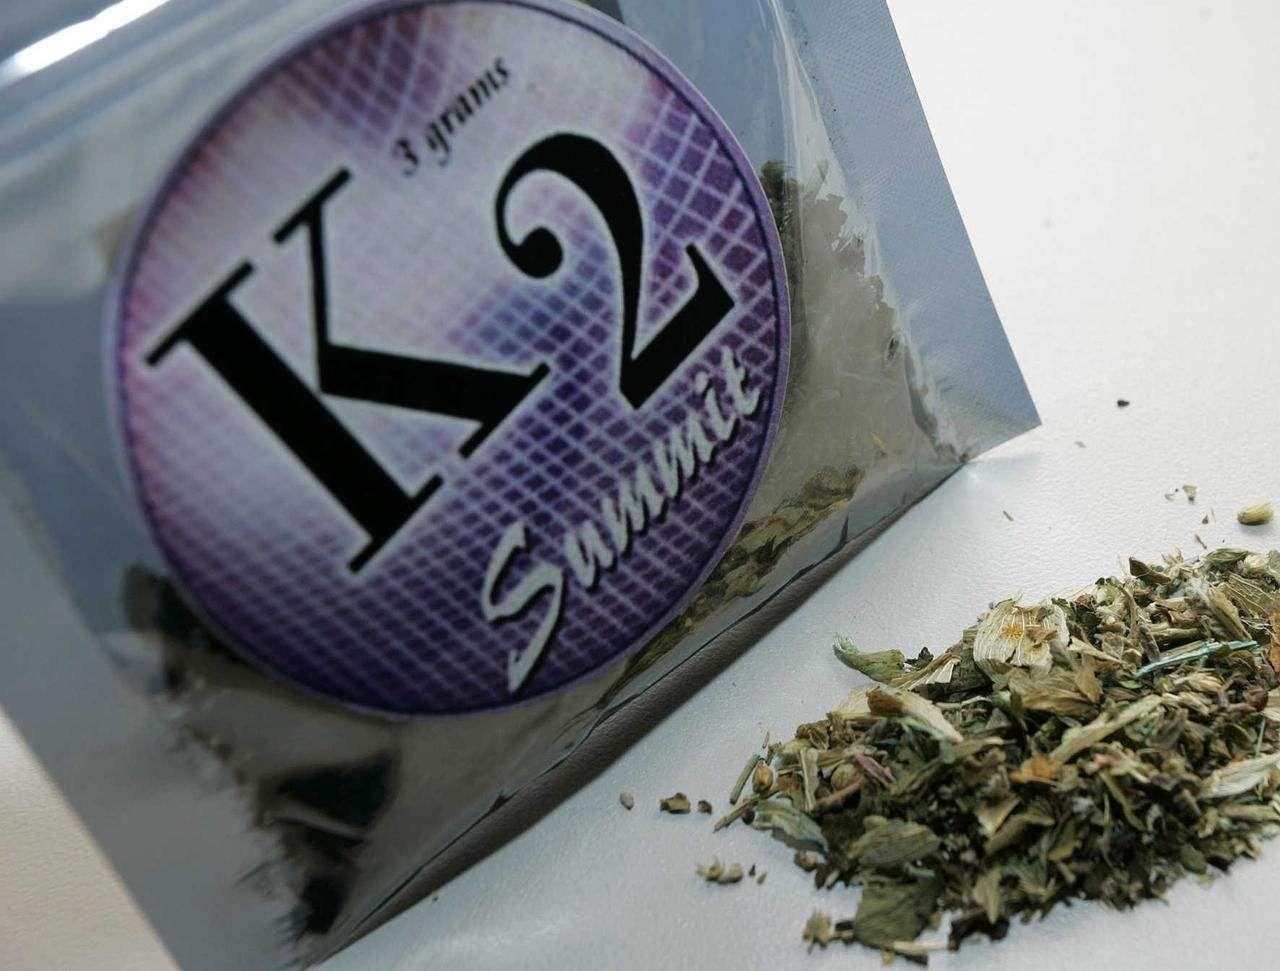 K2 o Spice es como se conoce a la peligrosa marihuana sintética